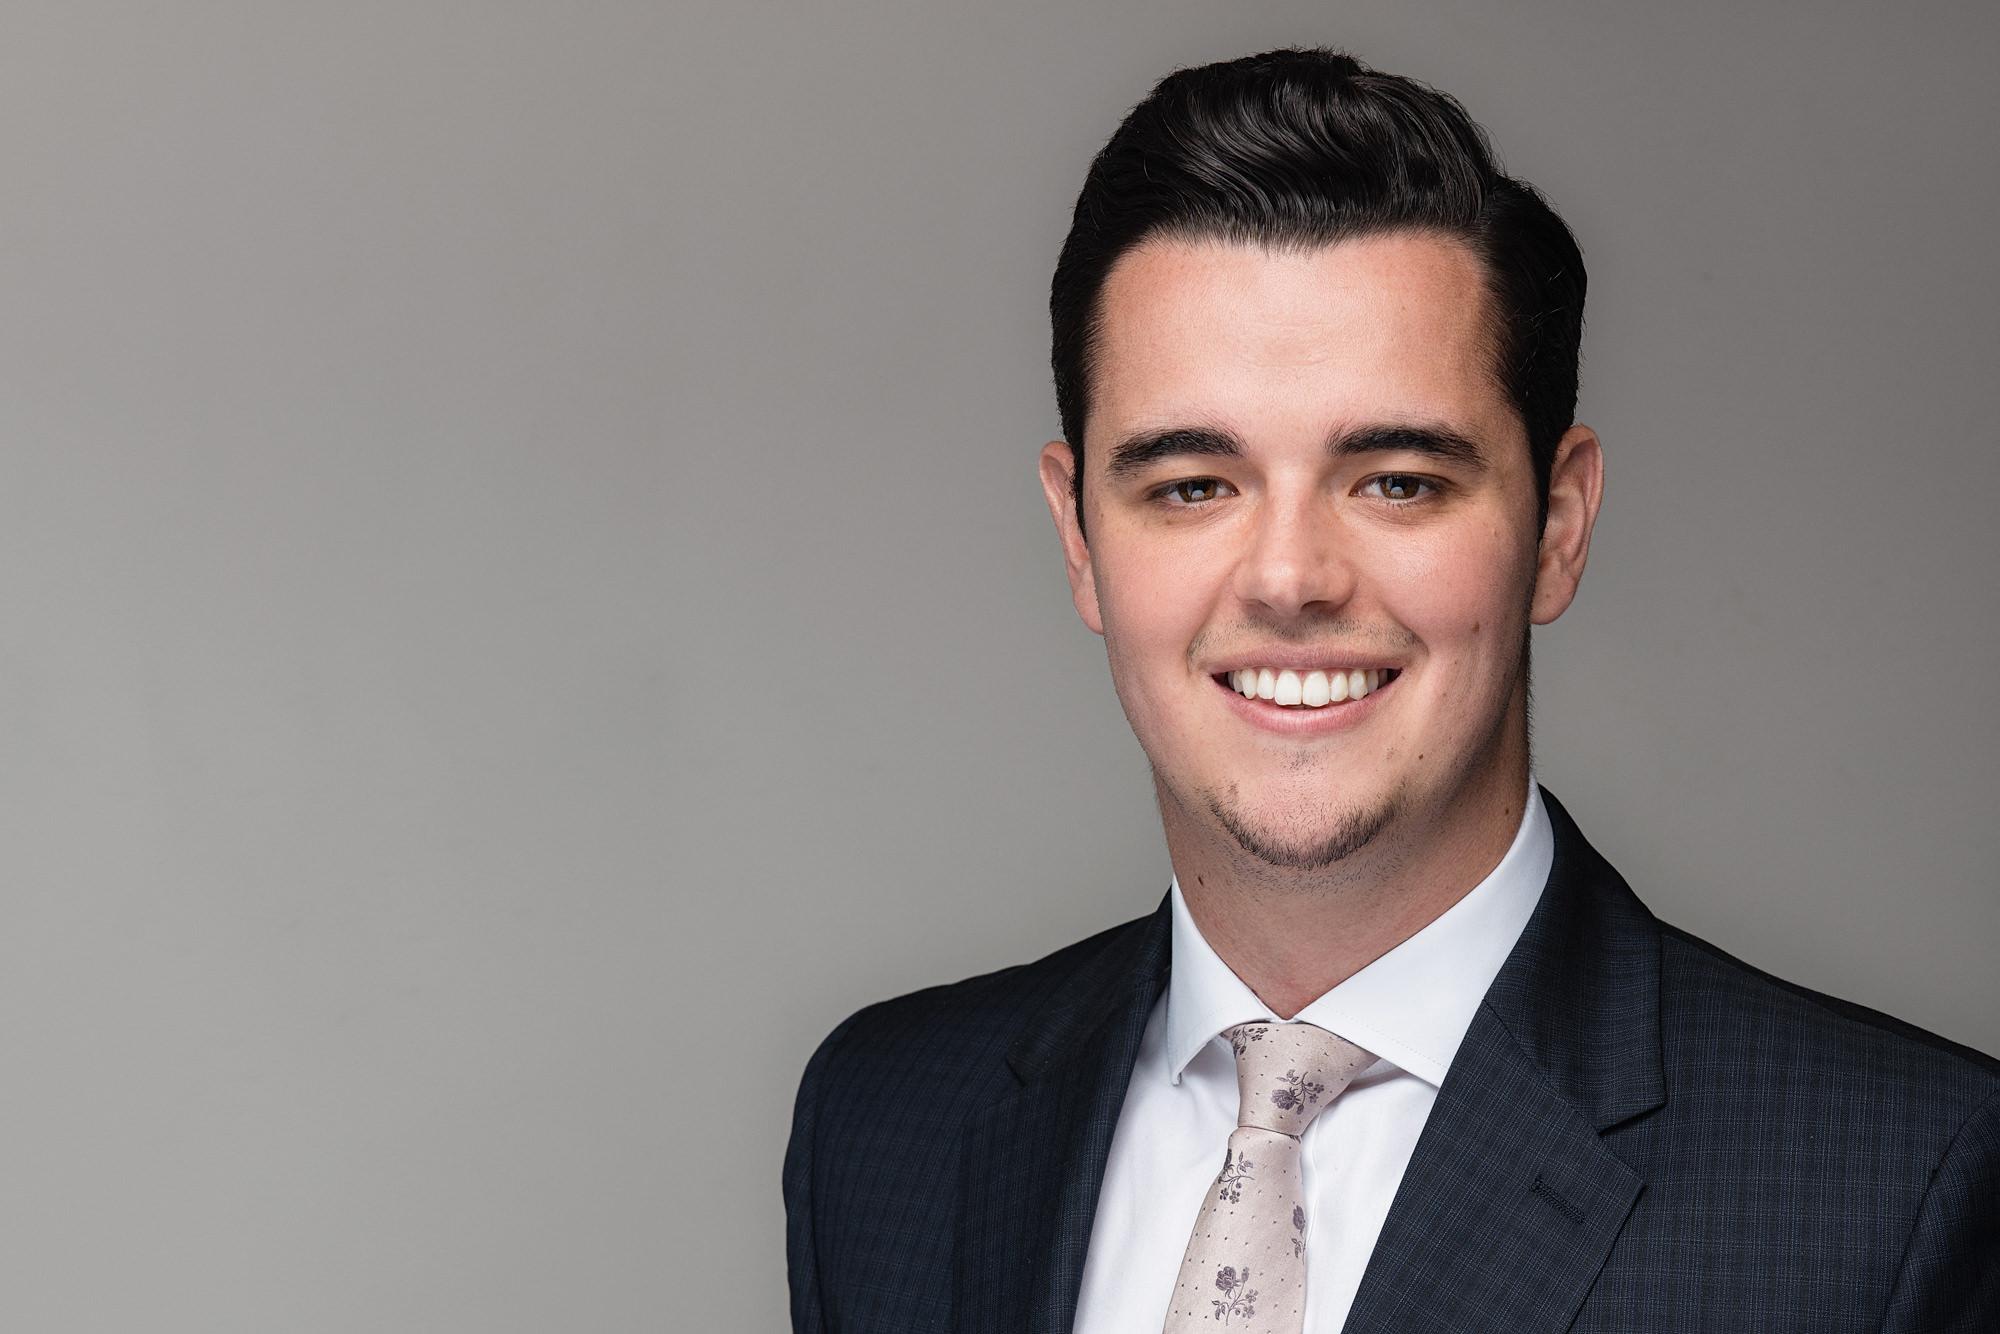 Hartmann-Young Business Headshots in Leeds